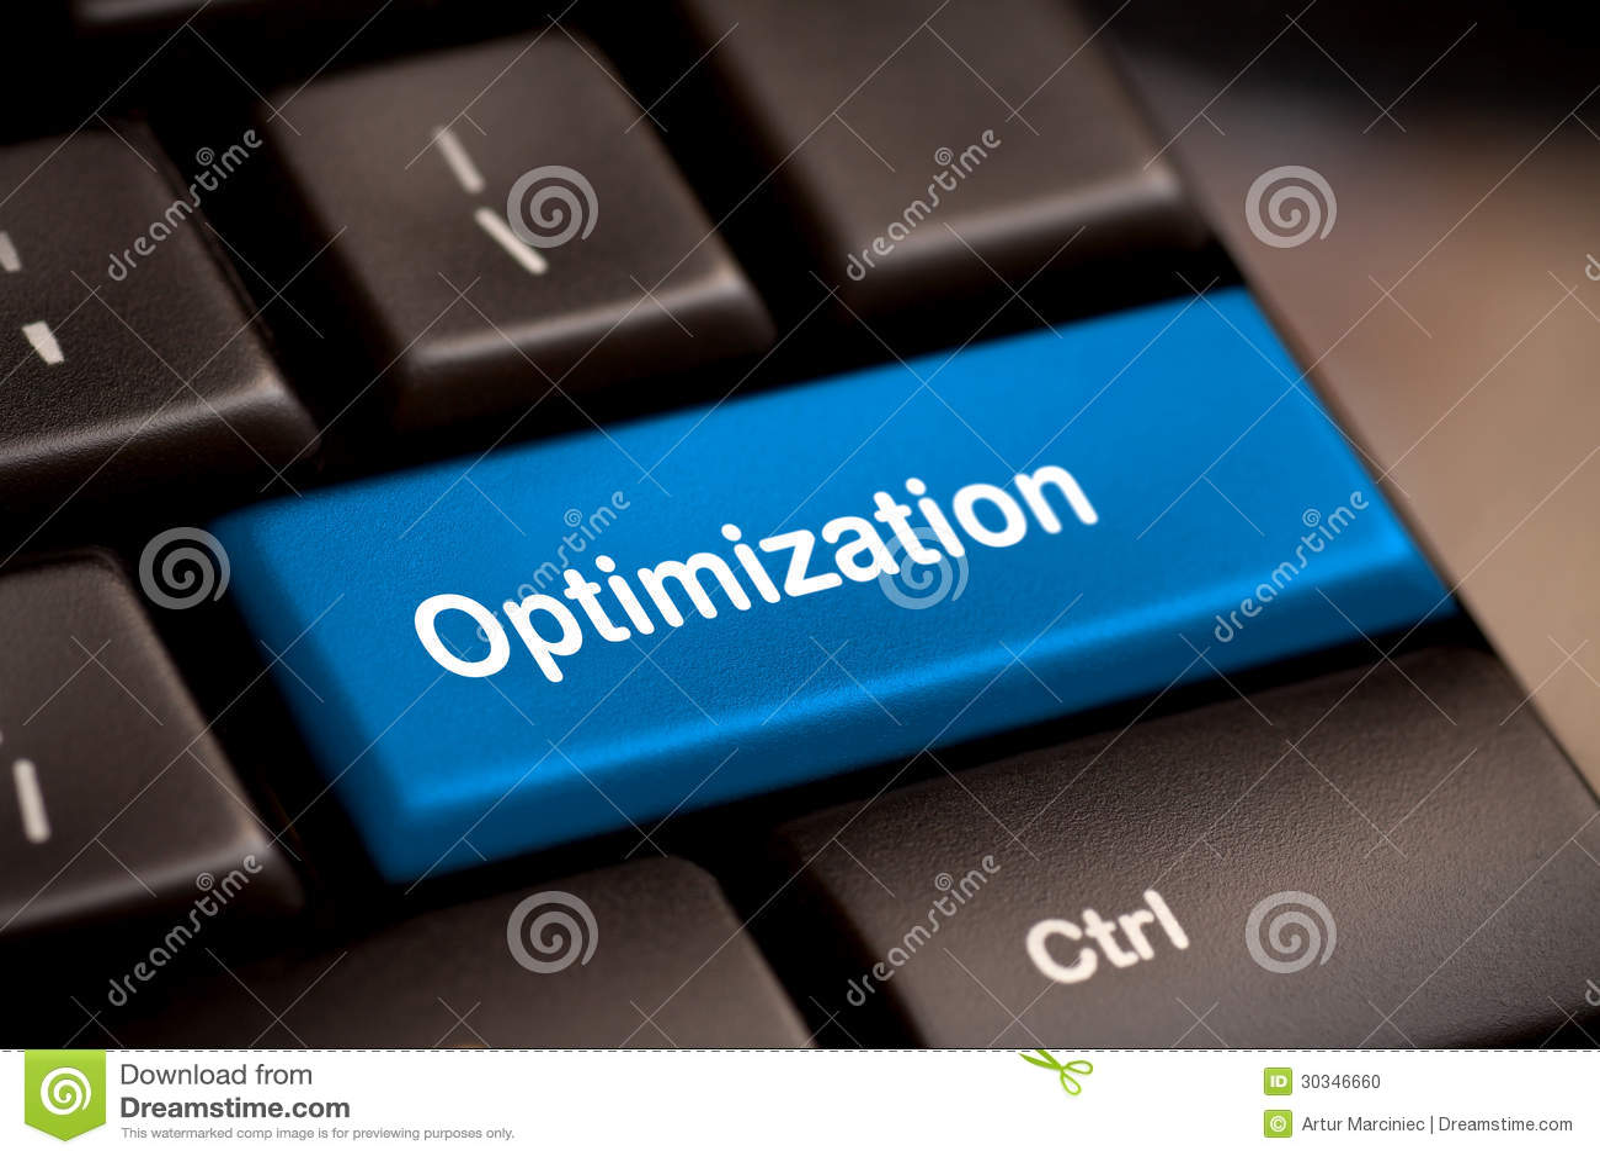 Key with Optimization word on laptop keyboard.